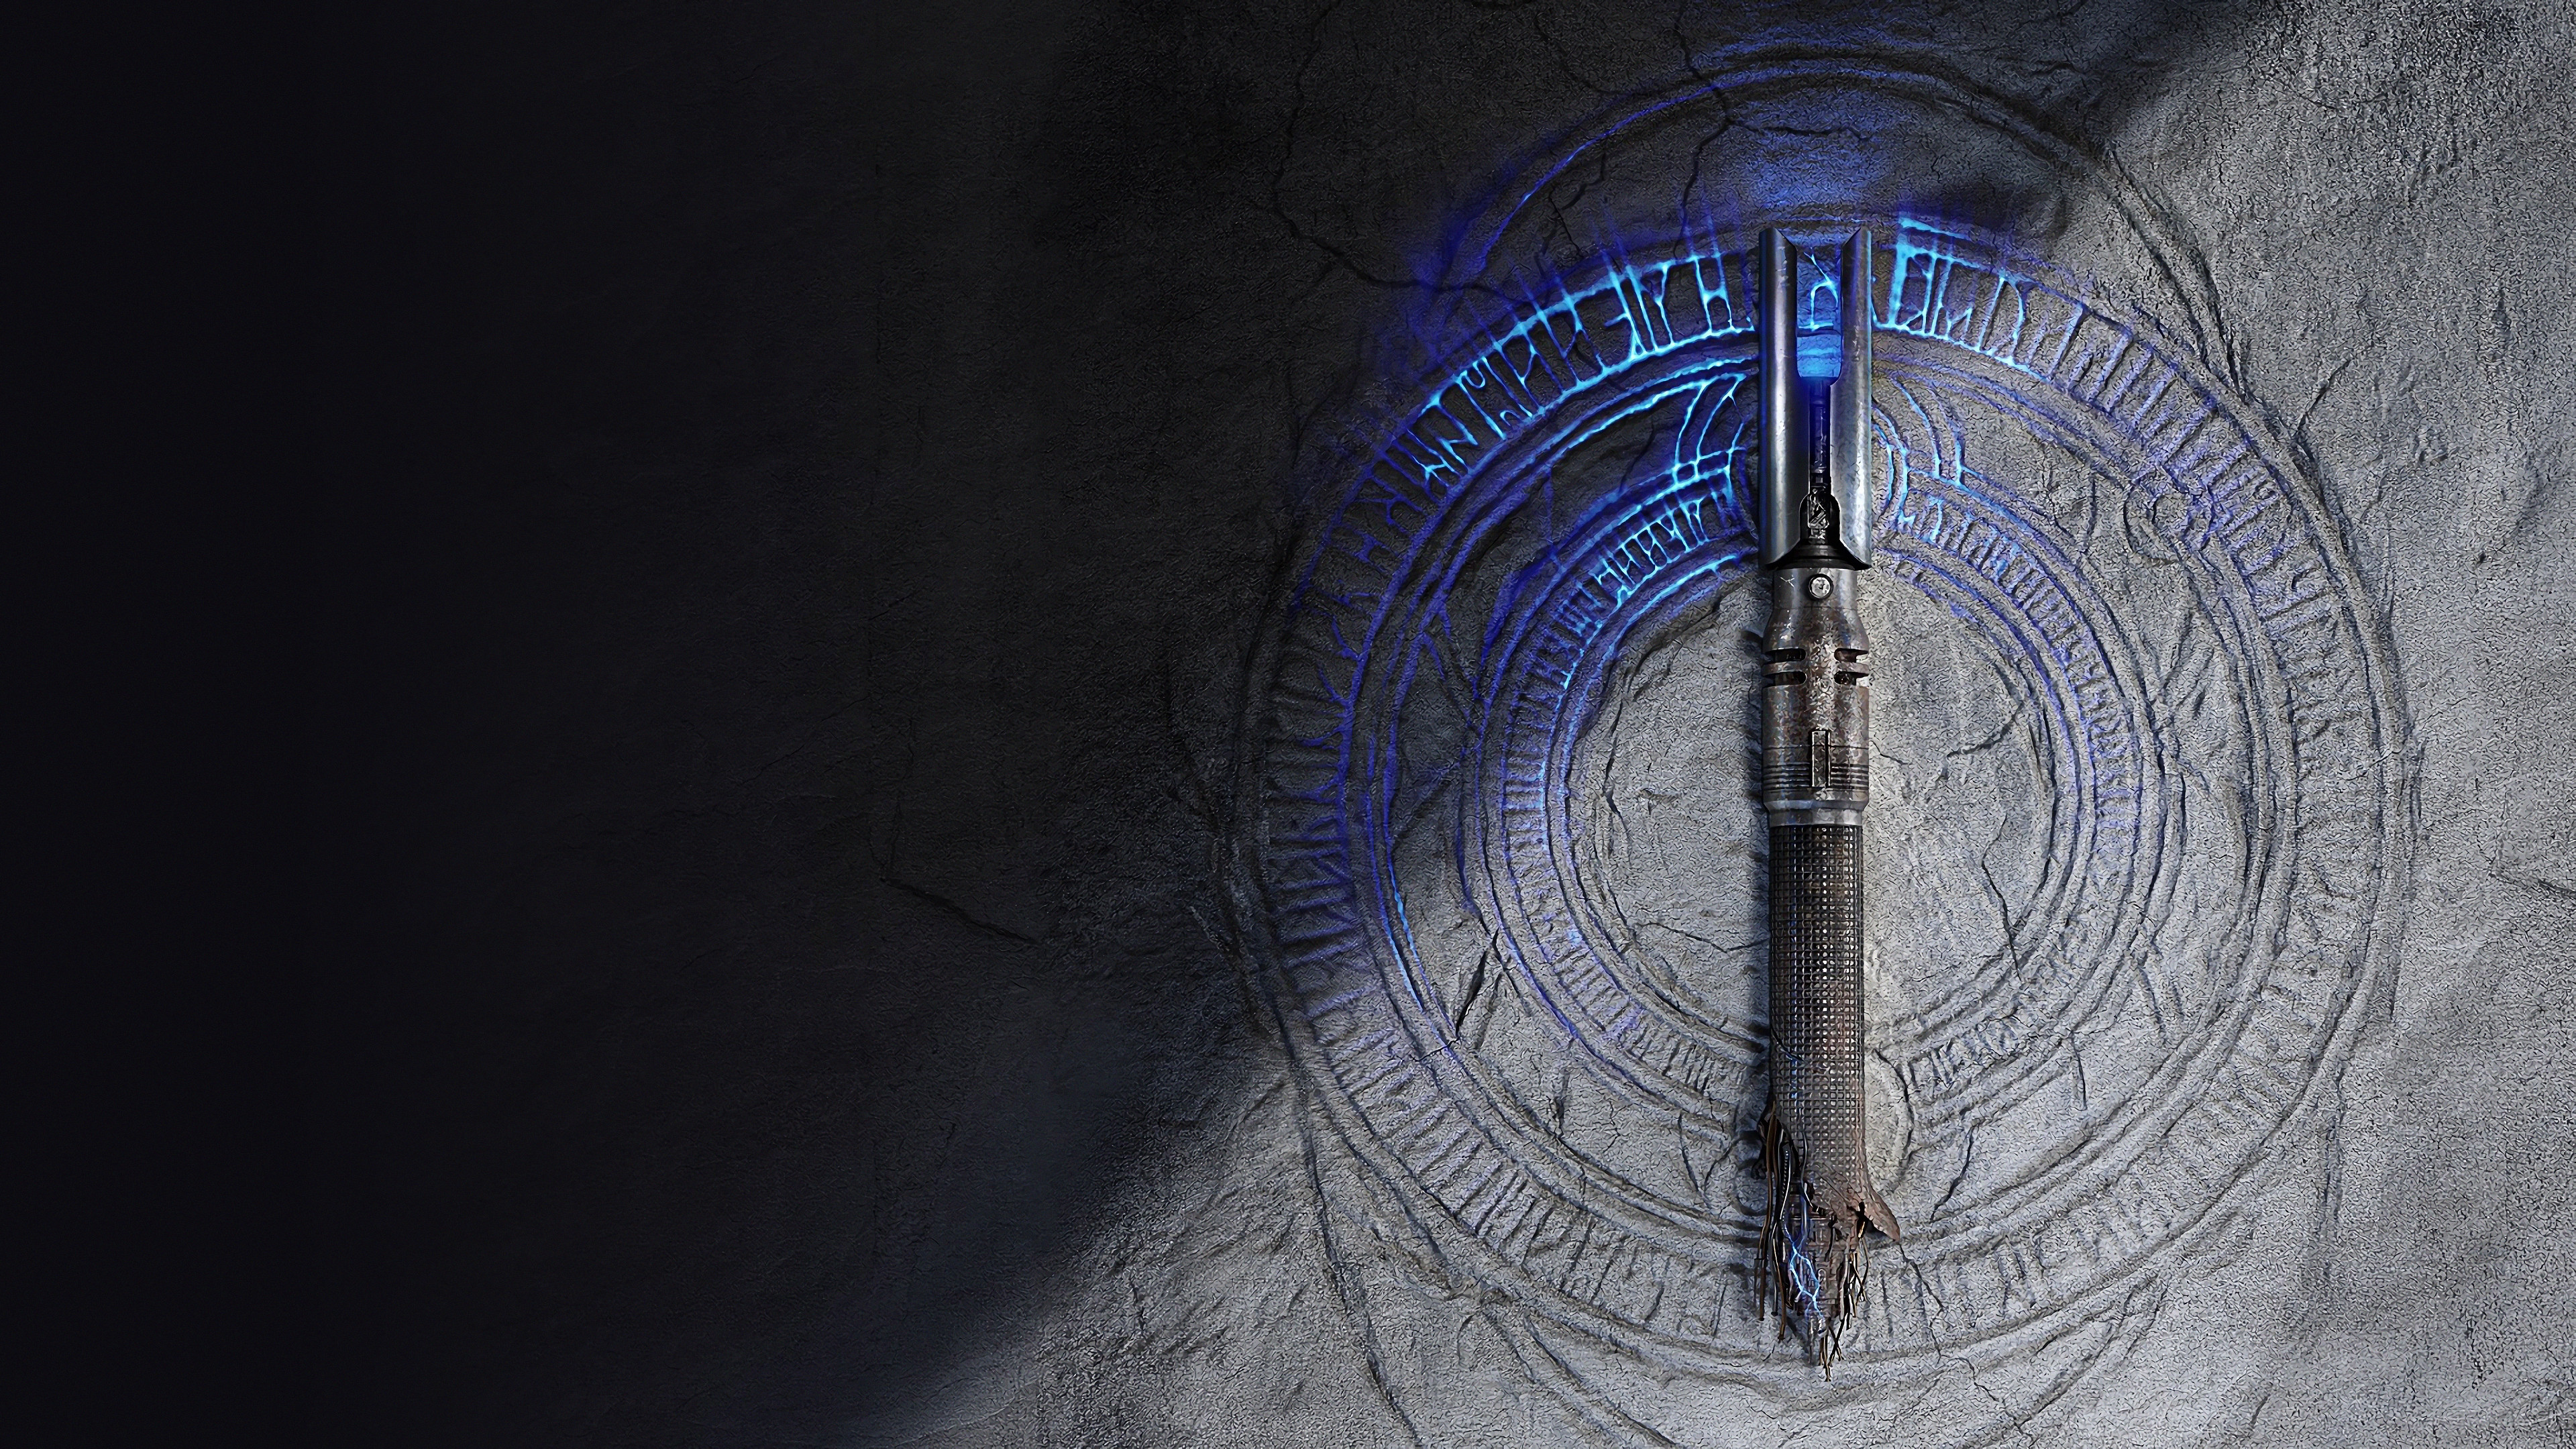 Star Wars Jedi Fallen Order Lightsaber 4k Wallpaper 18